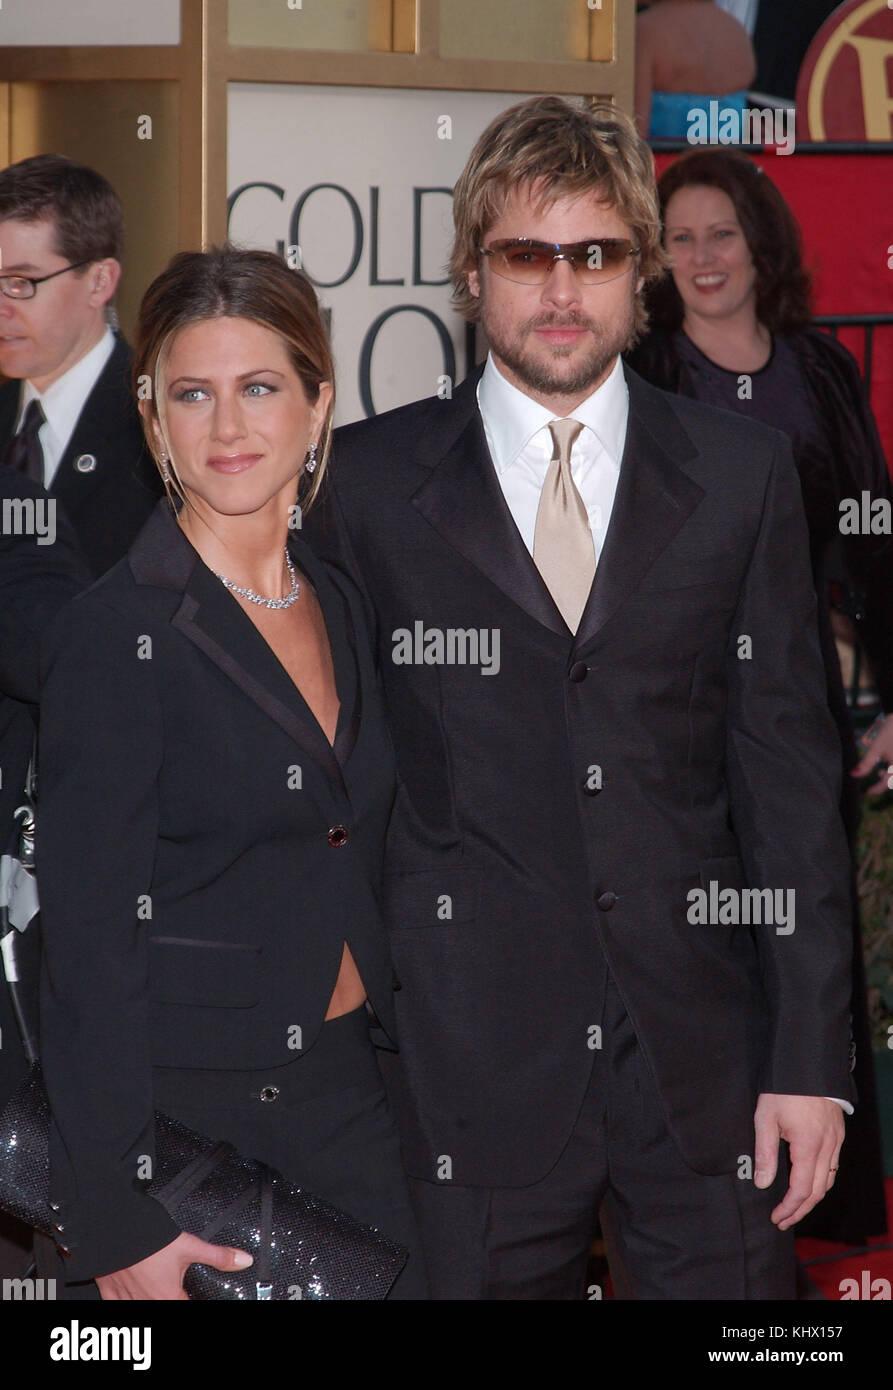 Jennifer Aniston and husband Brad Pitt arrive at The 59th